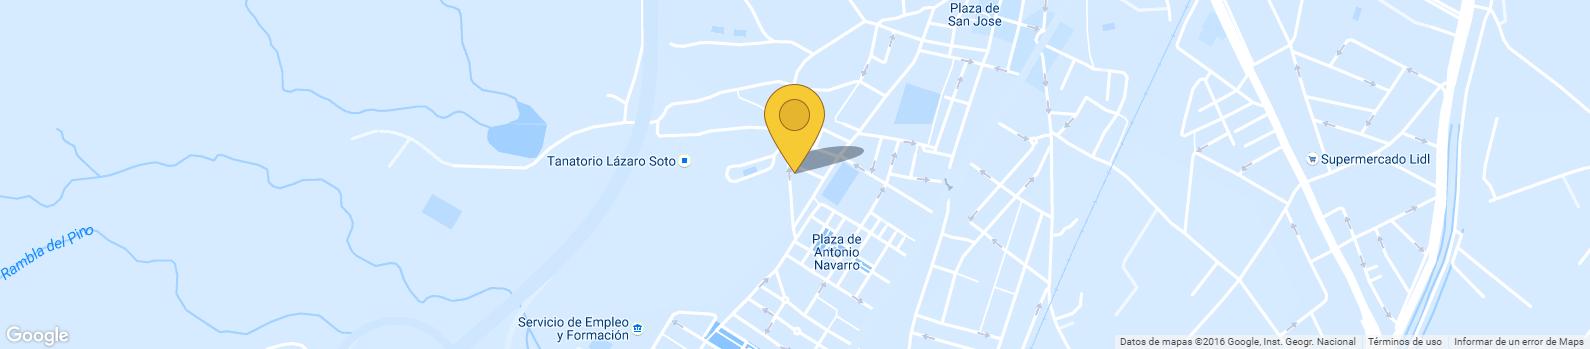 mapa-ubicacion-limpilorca